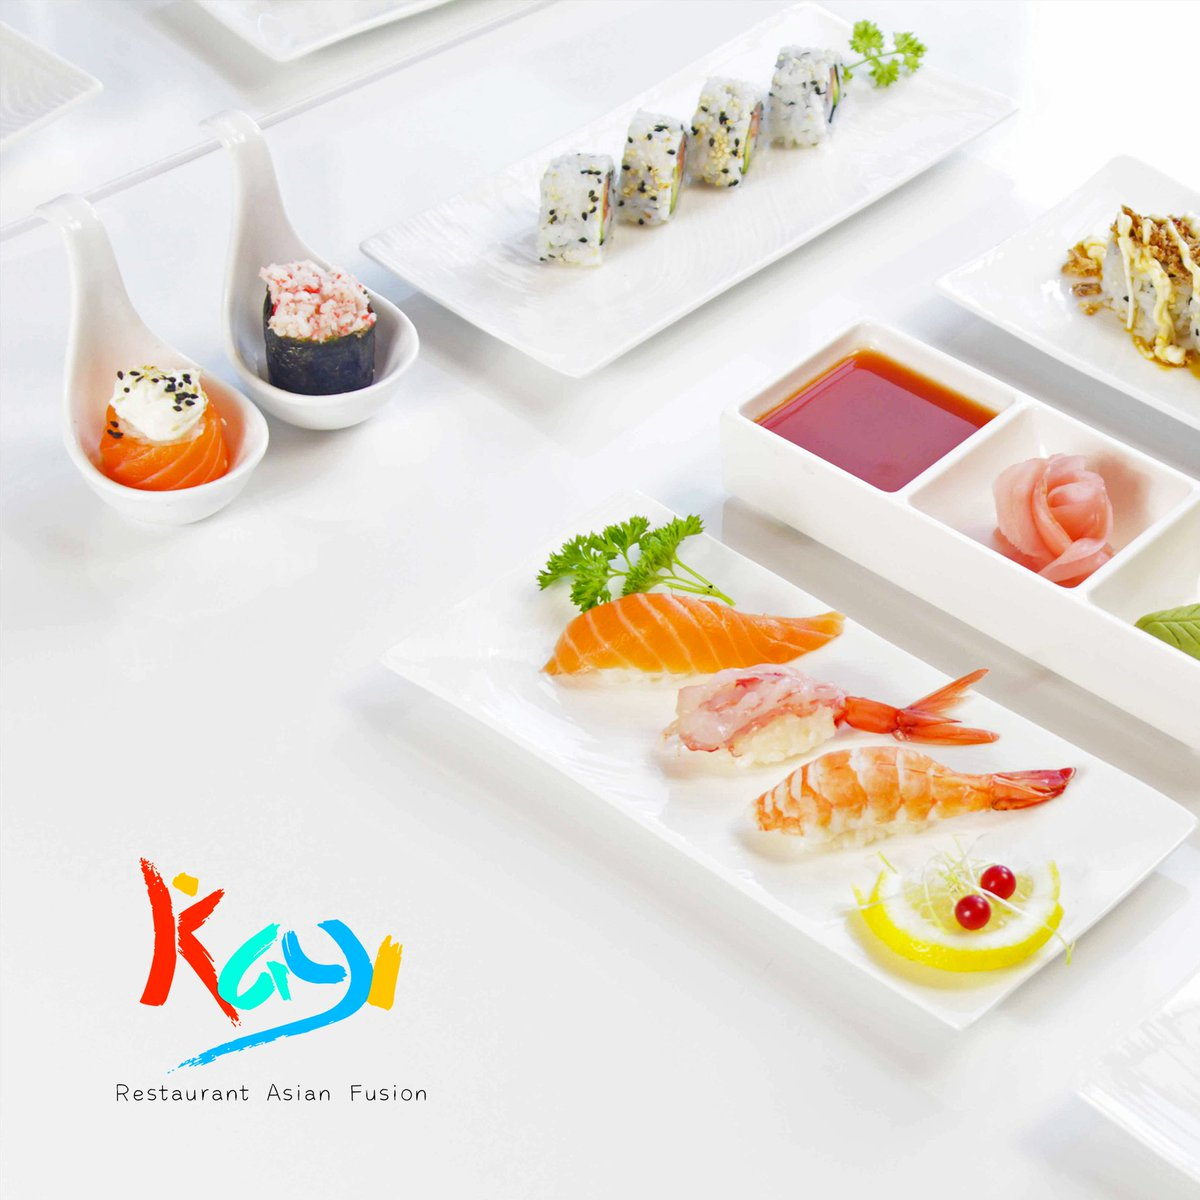 Kayi - Restaurant Asian Fusion's photo on Giovedì 14